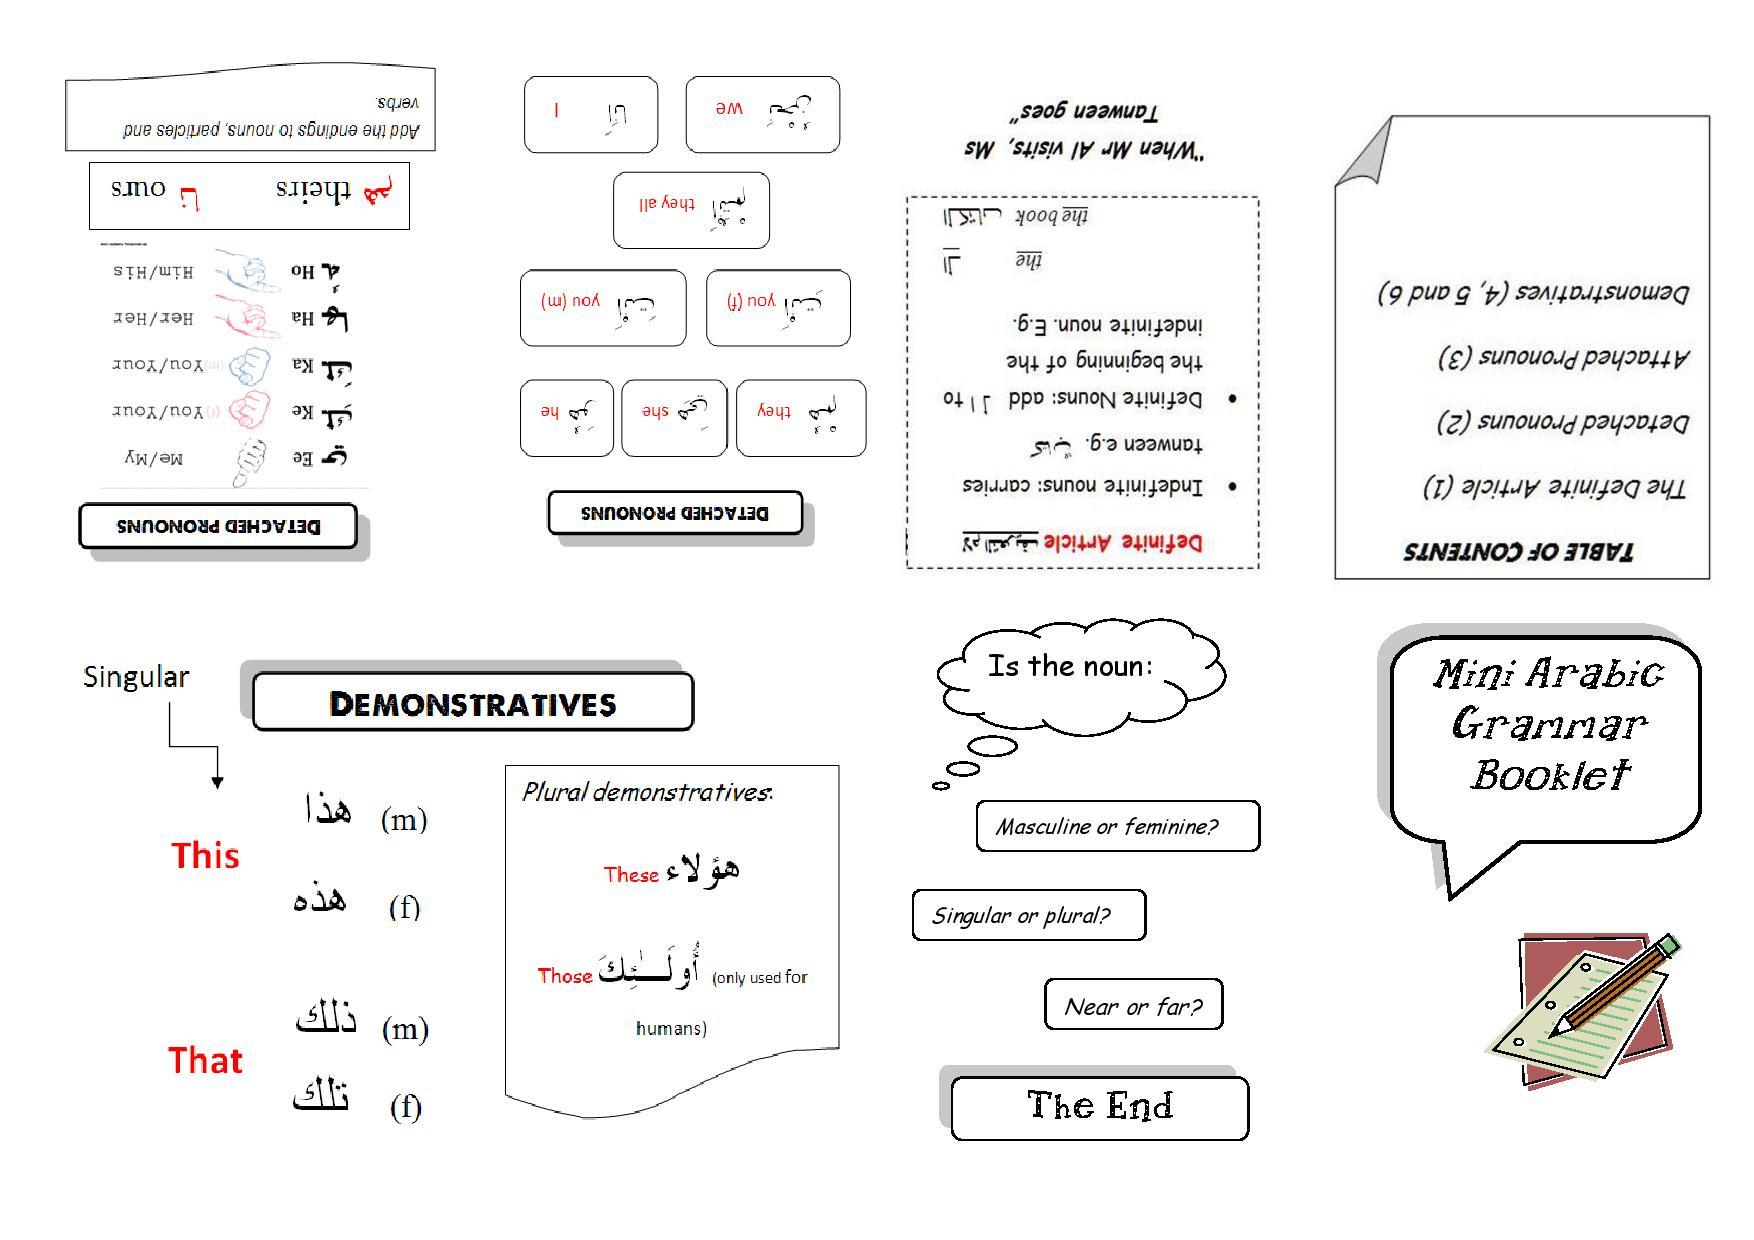 Mini Foldable Books For Arabic Grammar